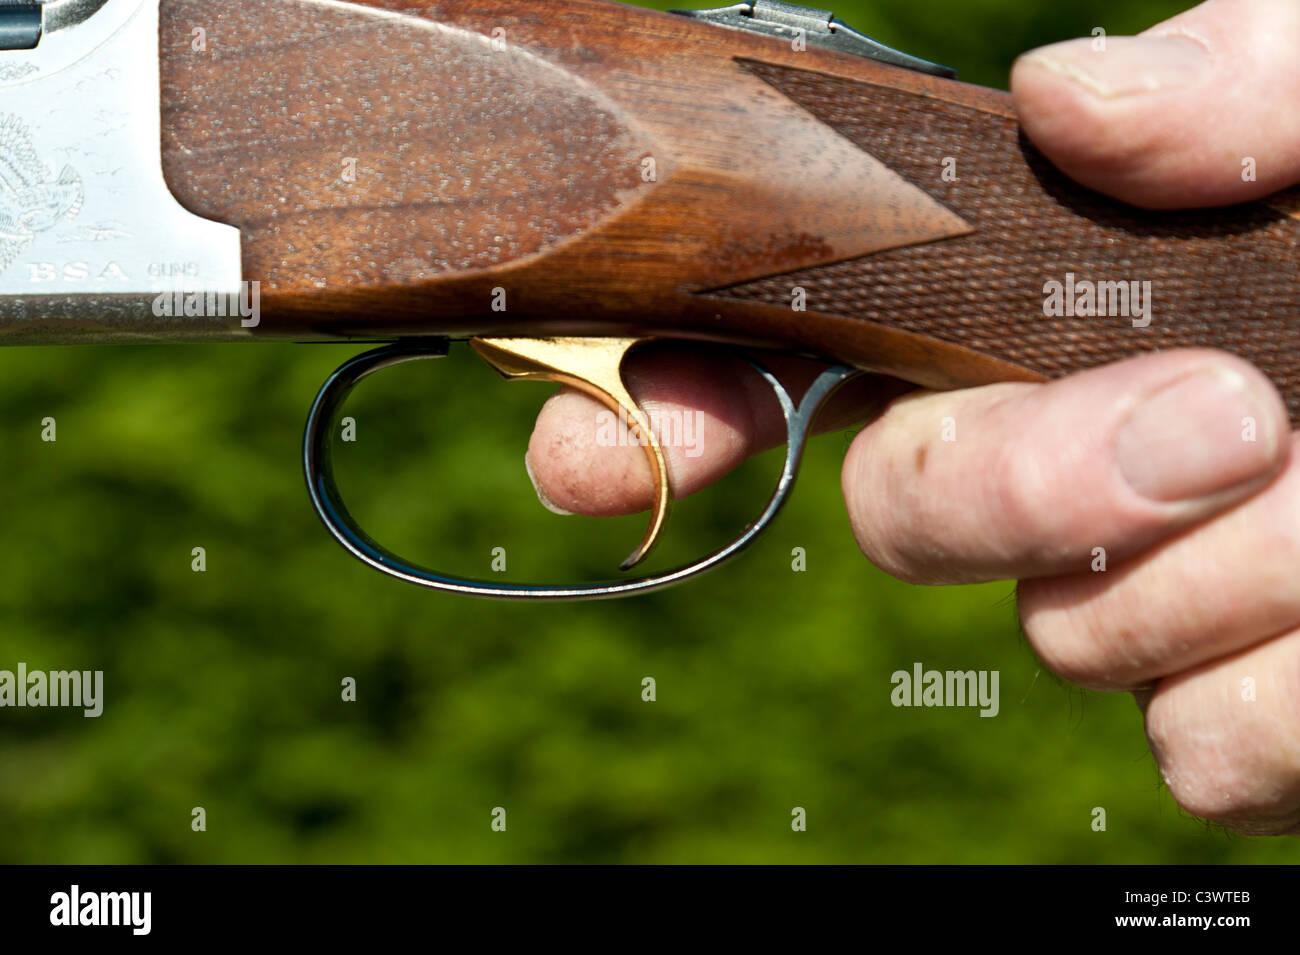 close up of mans finger on the trigger of a double barrel shotgun.landscape format.copy space. - Stock Image